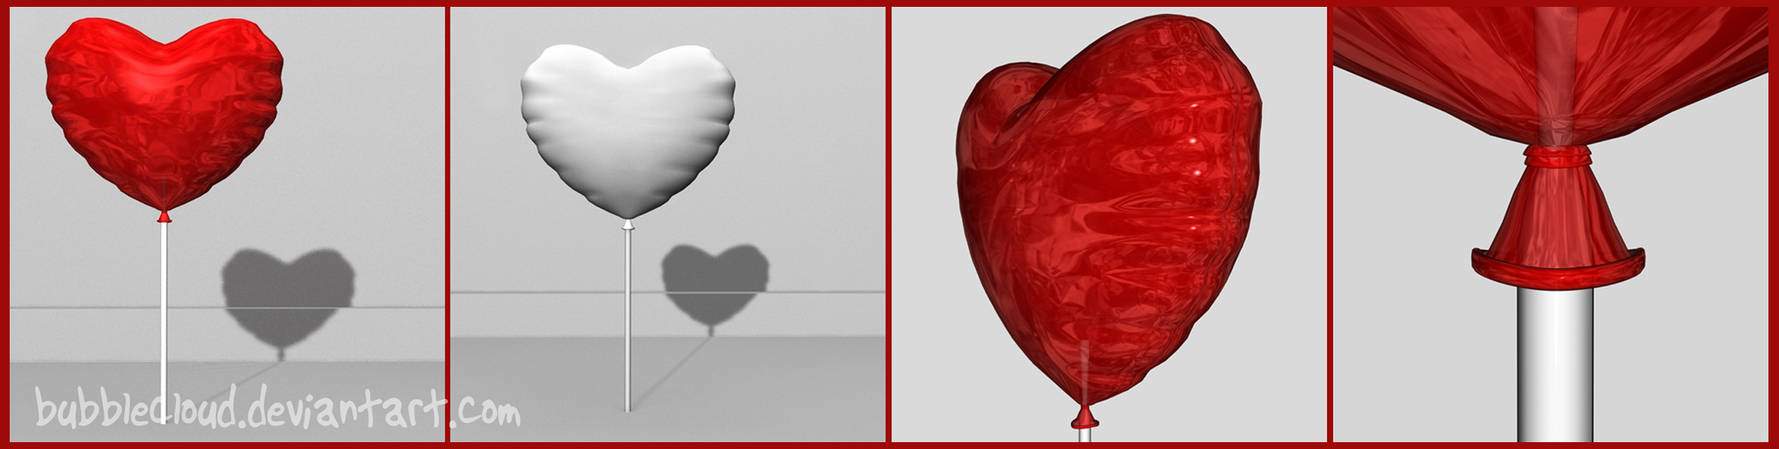 Heart Balloon Free 3D model